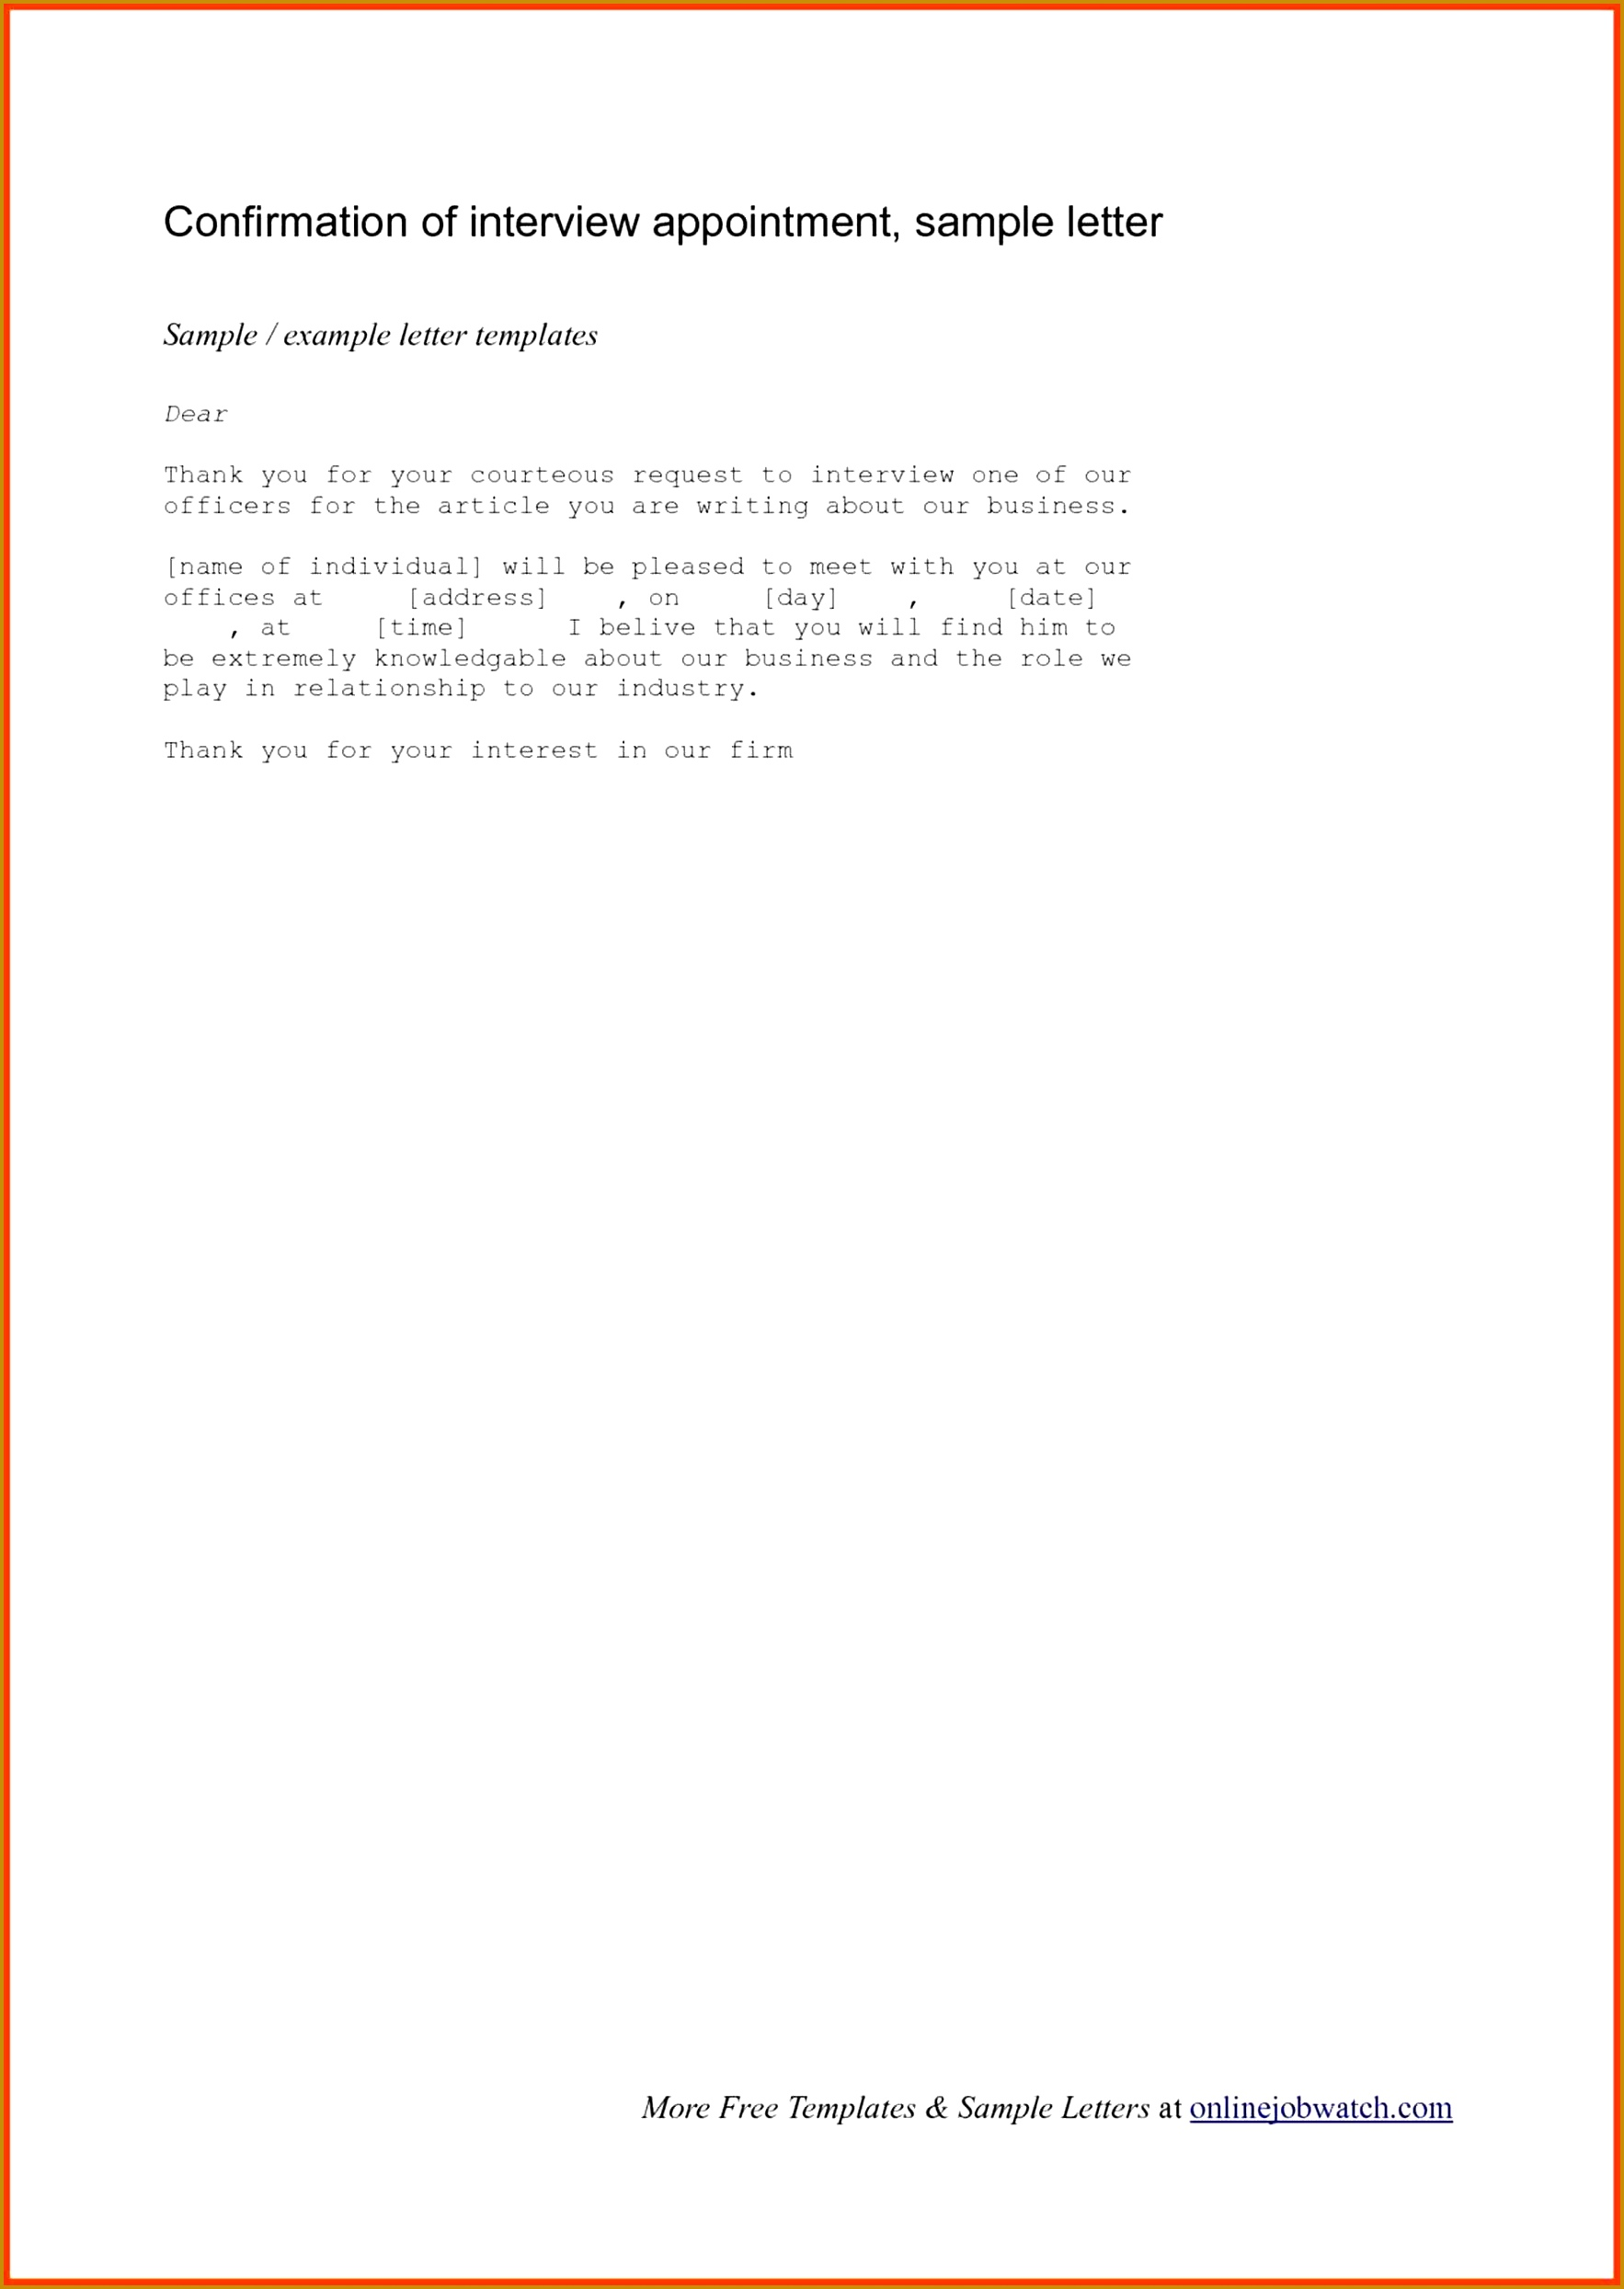 5 meeting confirmation email sample fabtemplatez meeting confirmation email sample 58430 business meeting confirmation email employee appointment meeting spiritdancerdesigns Choice Image